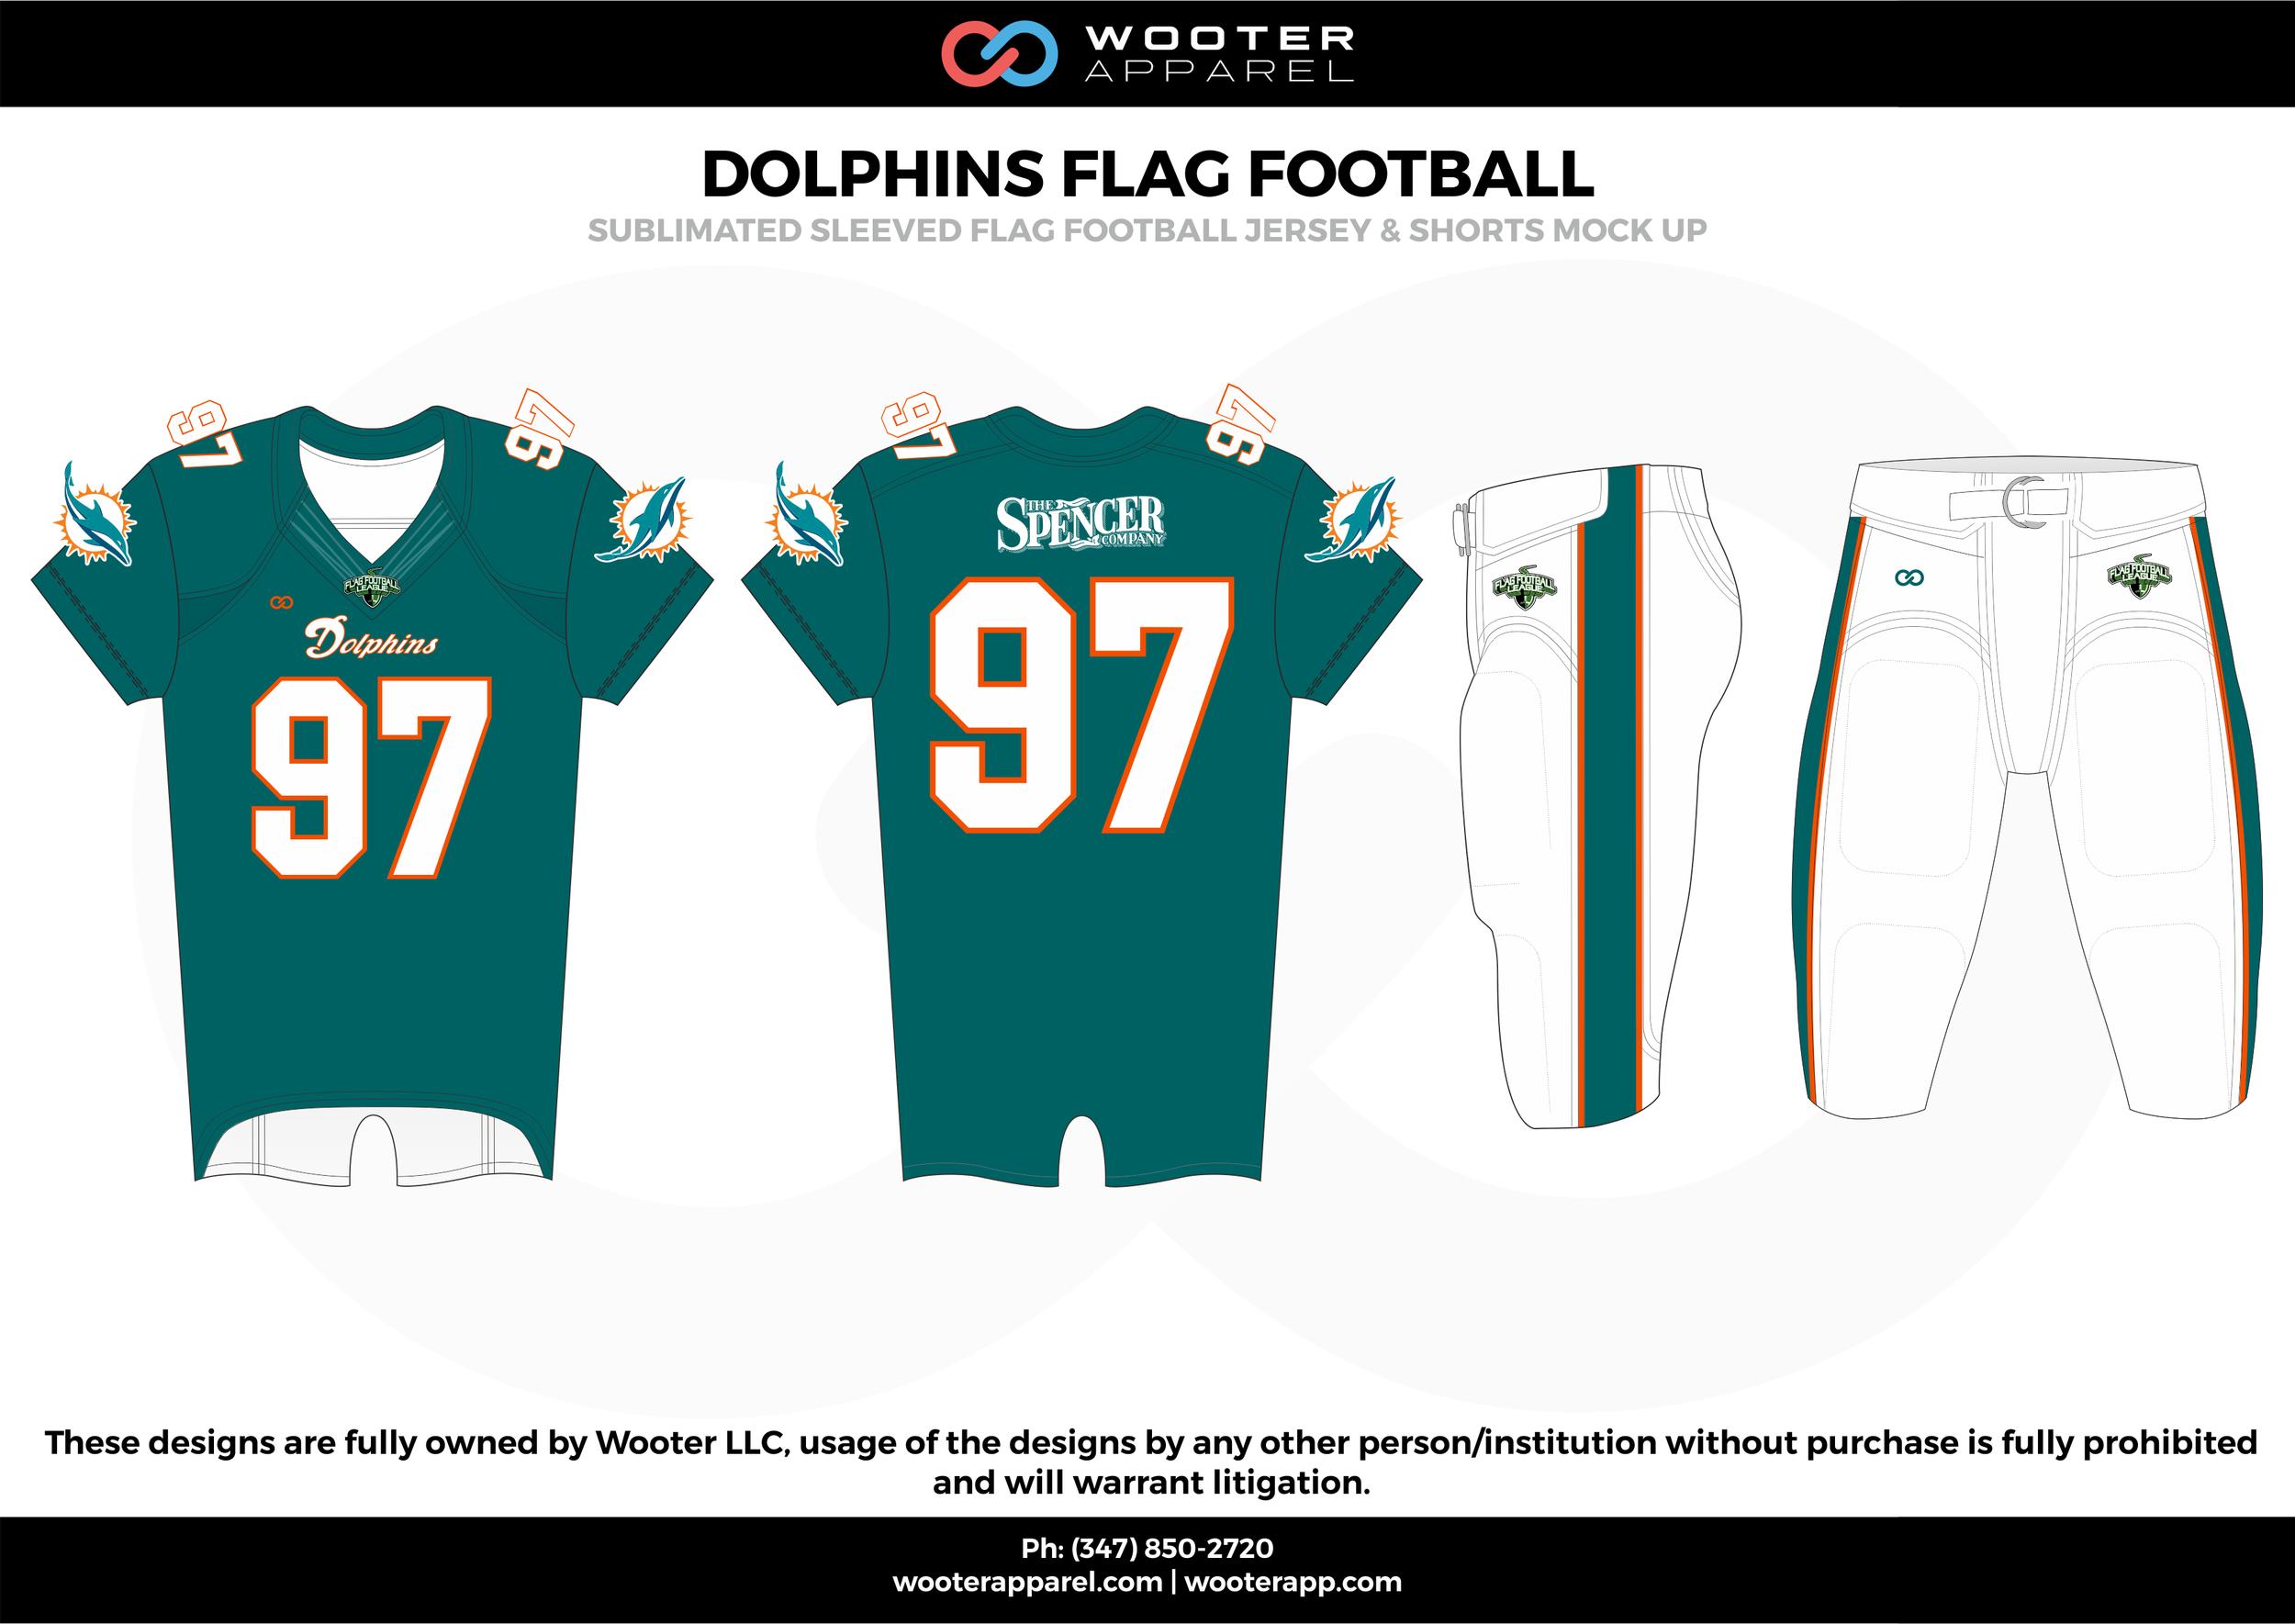 DOLPHINS FLAG FOOTBALL ocean blue white flag football uniforms jerseys pants